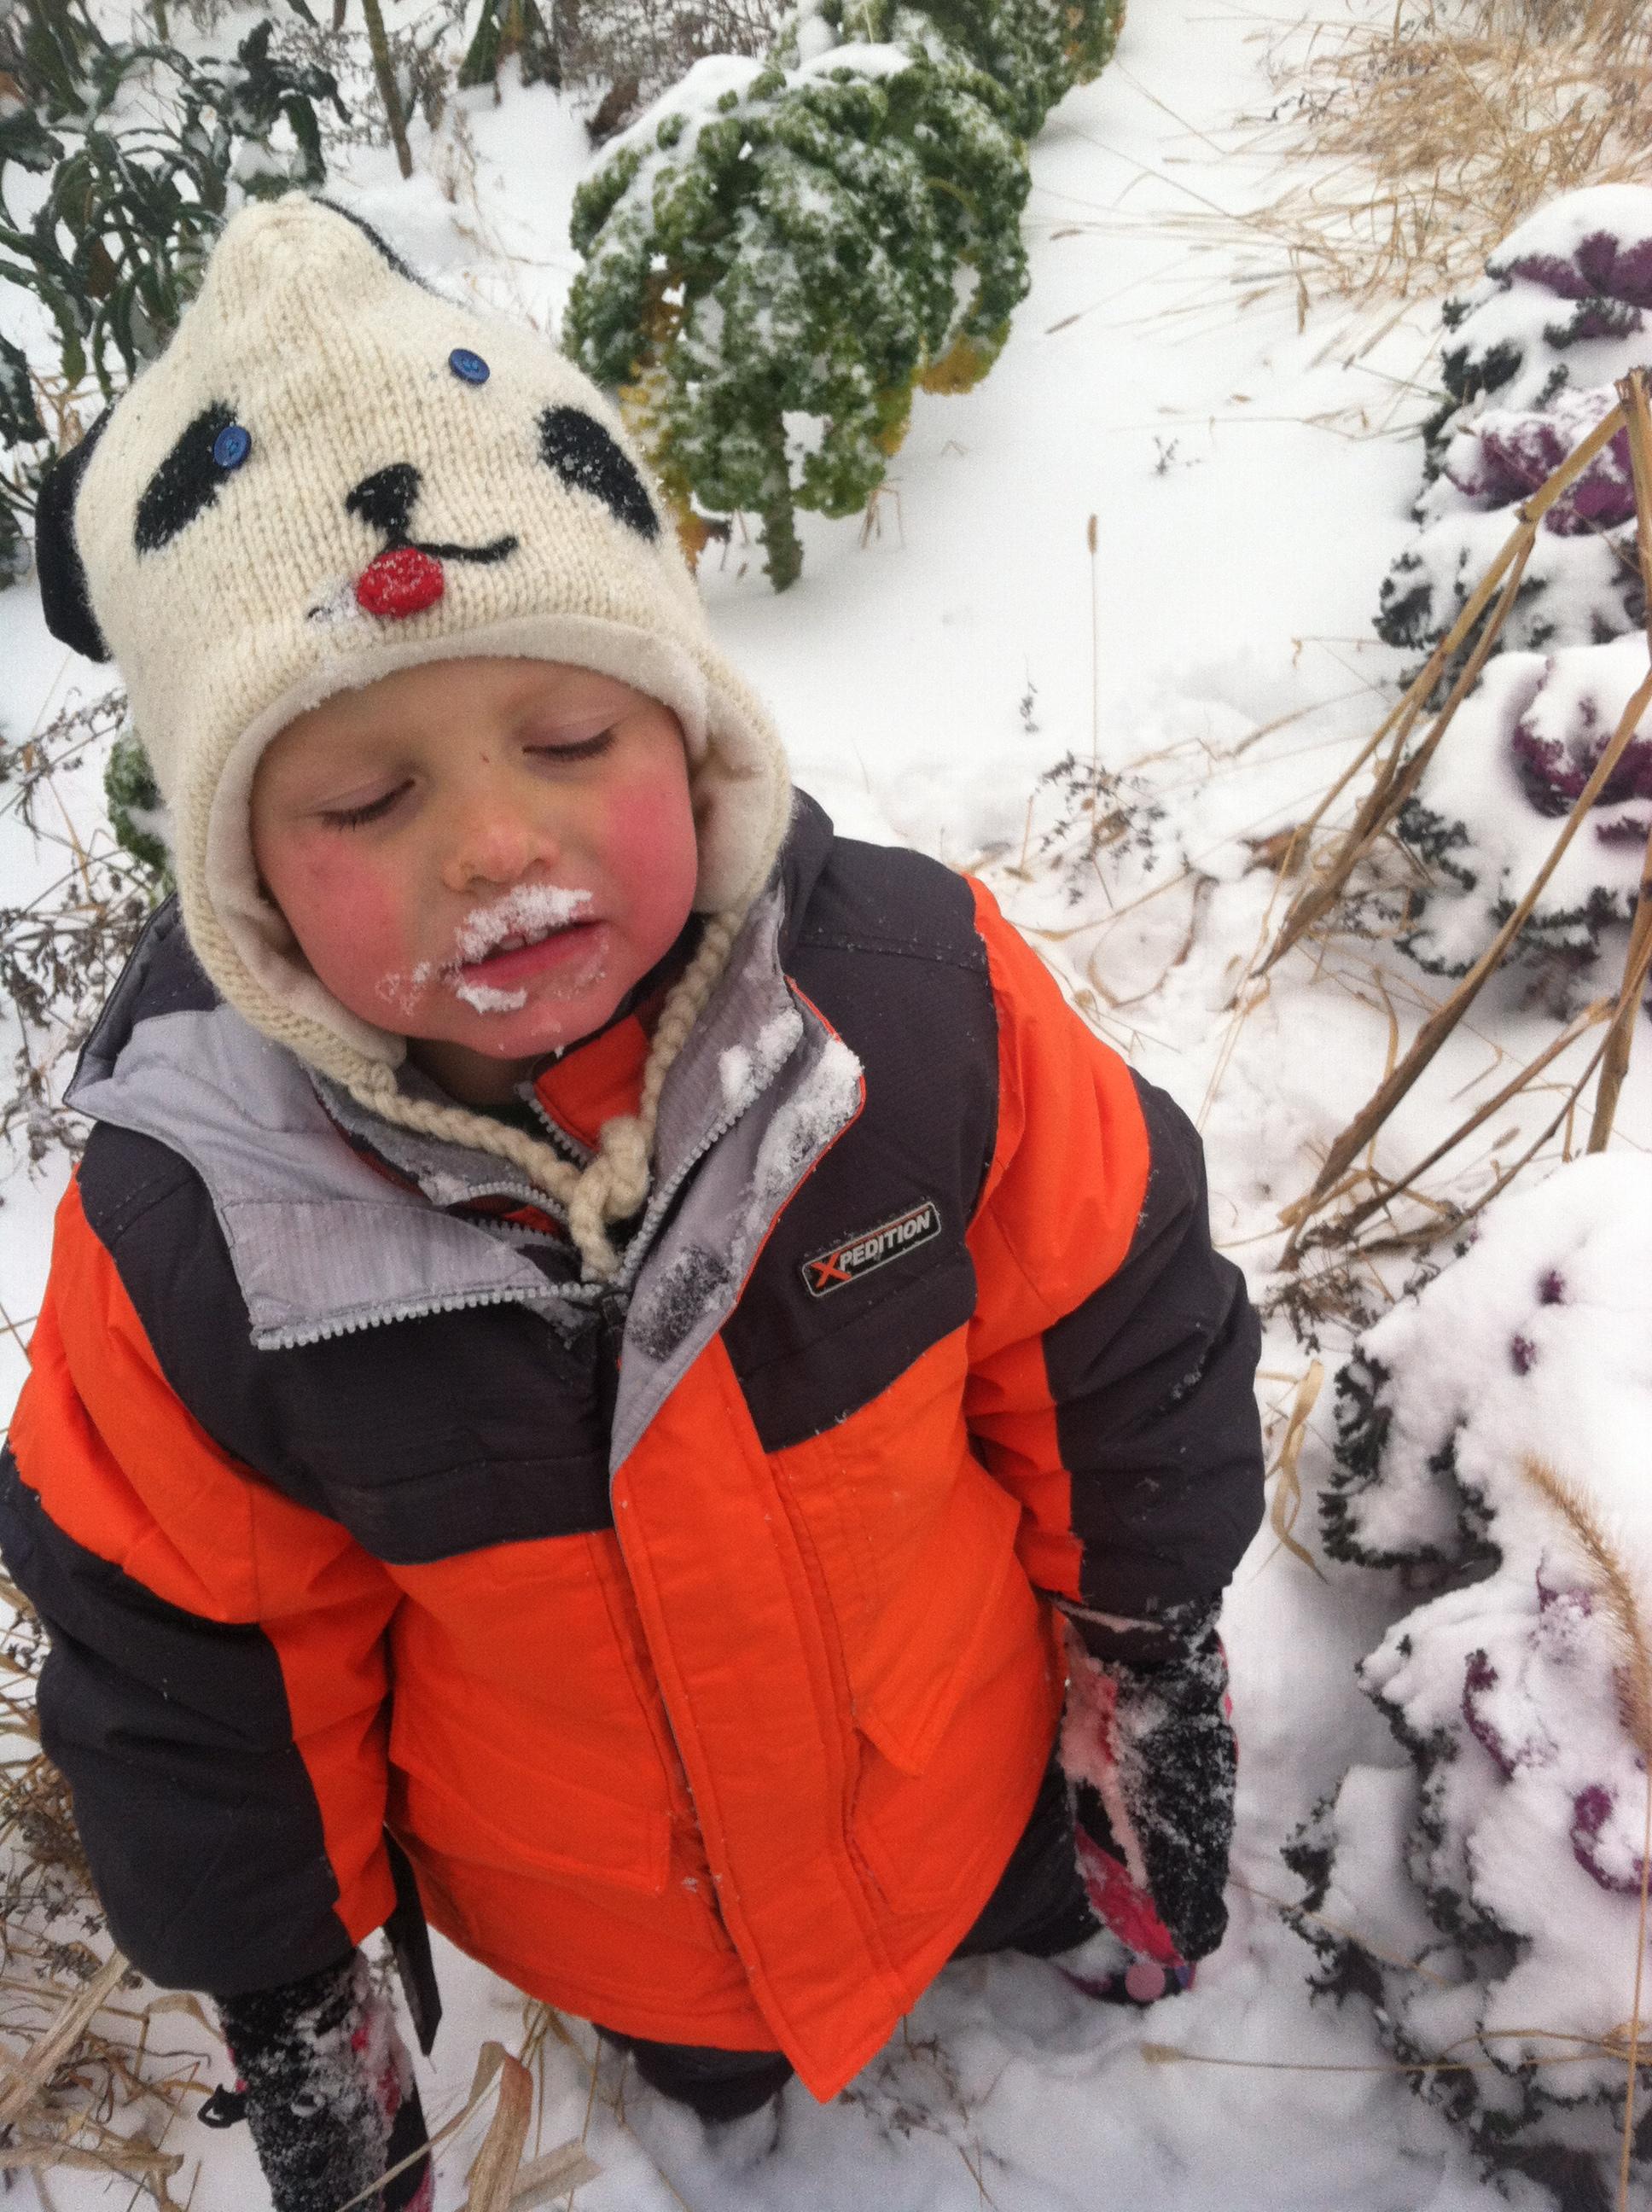 Taste testing the snow!